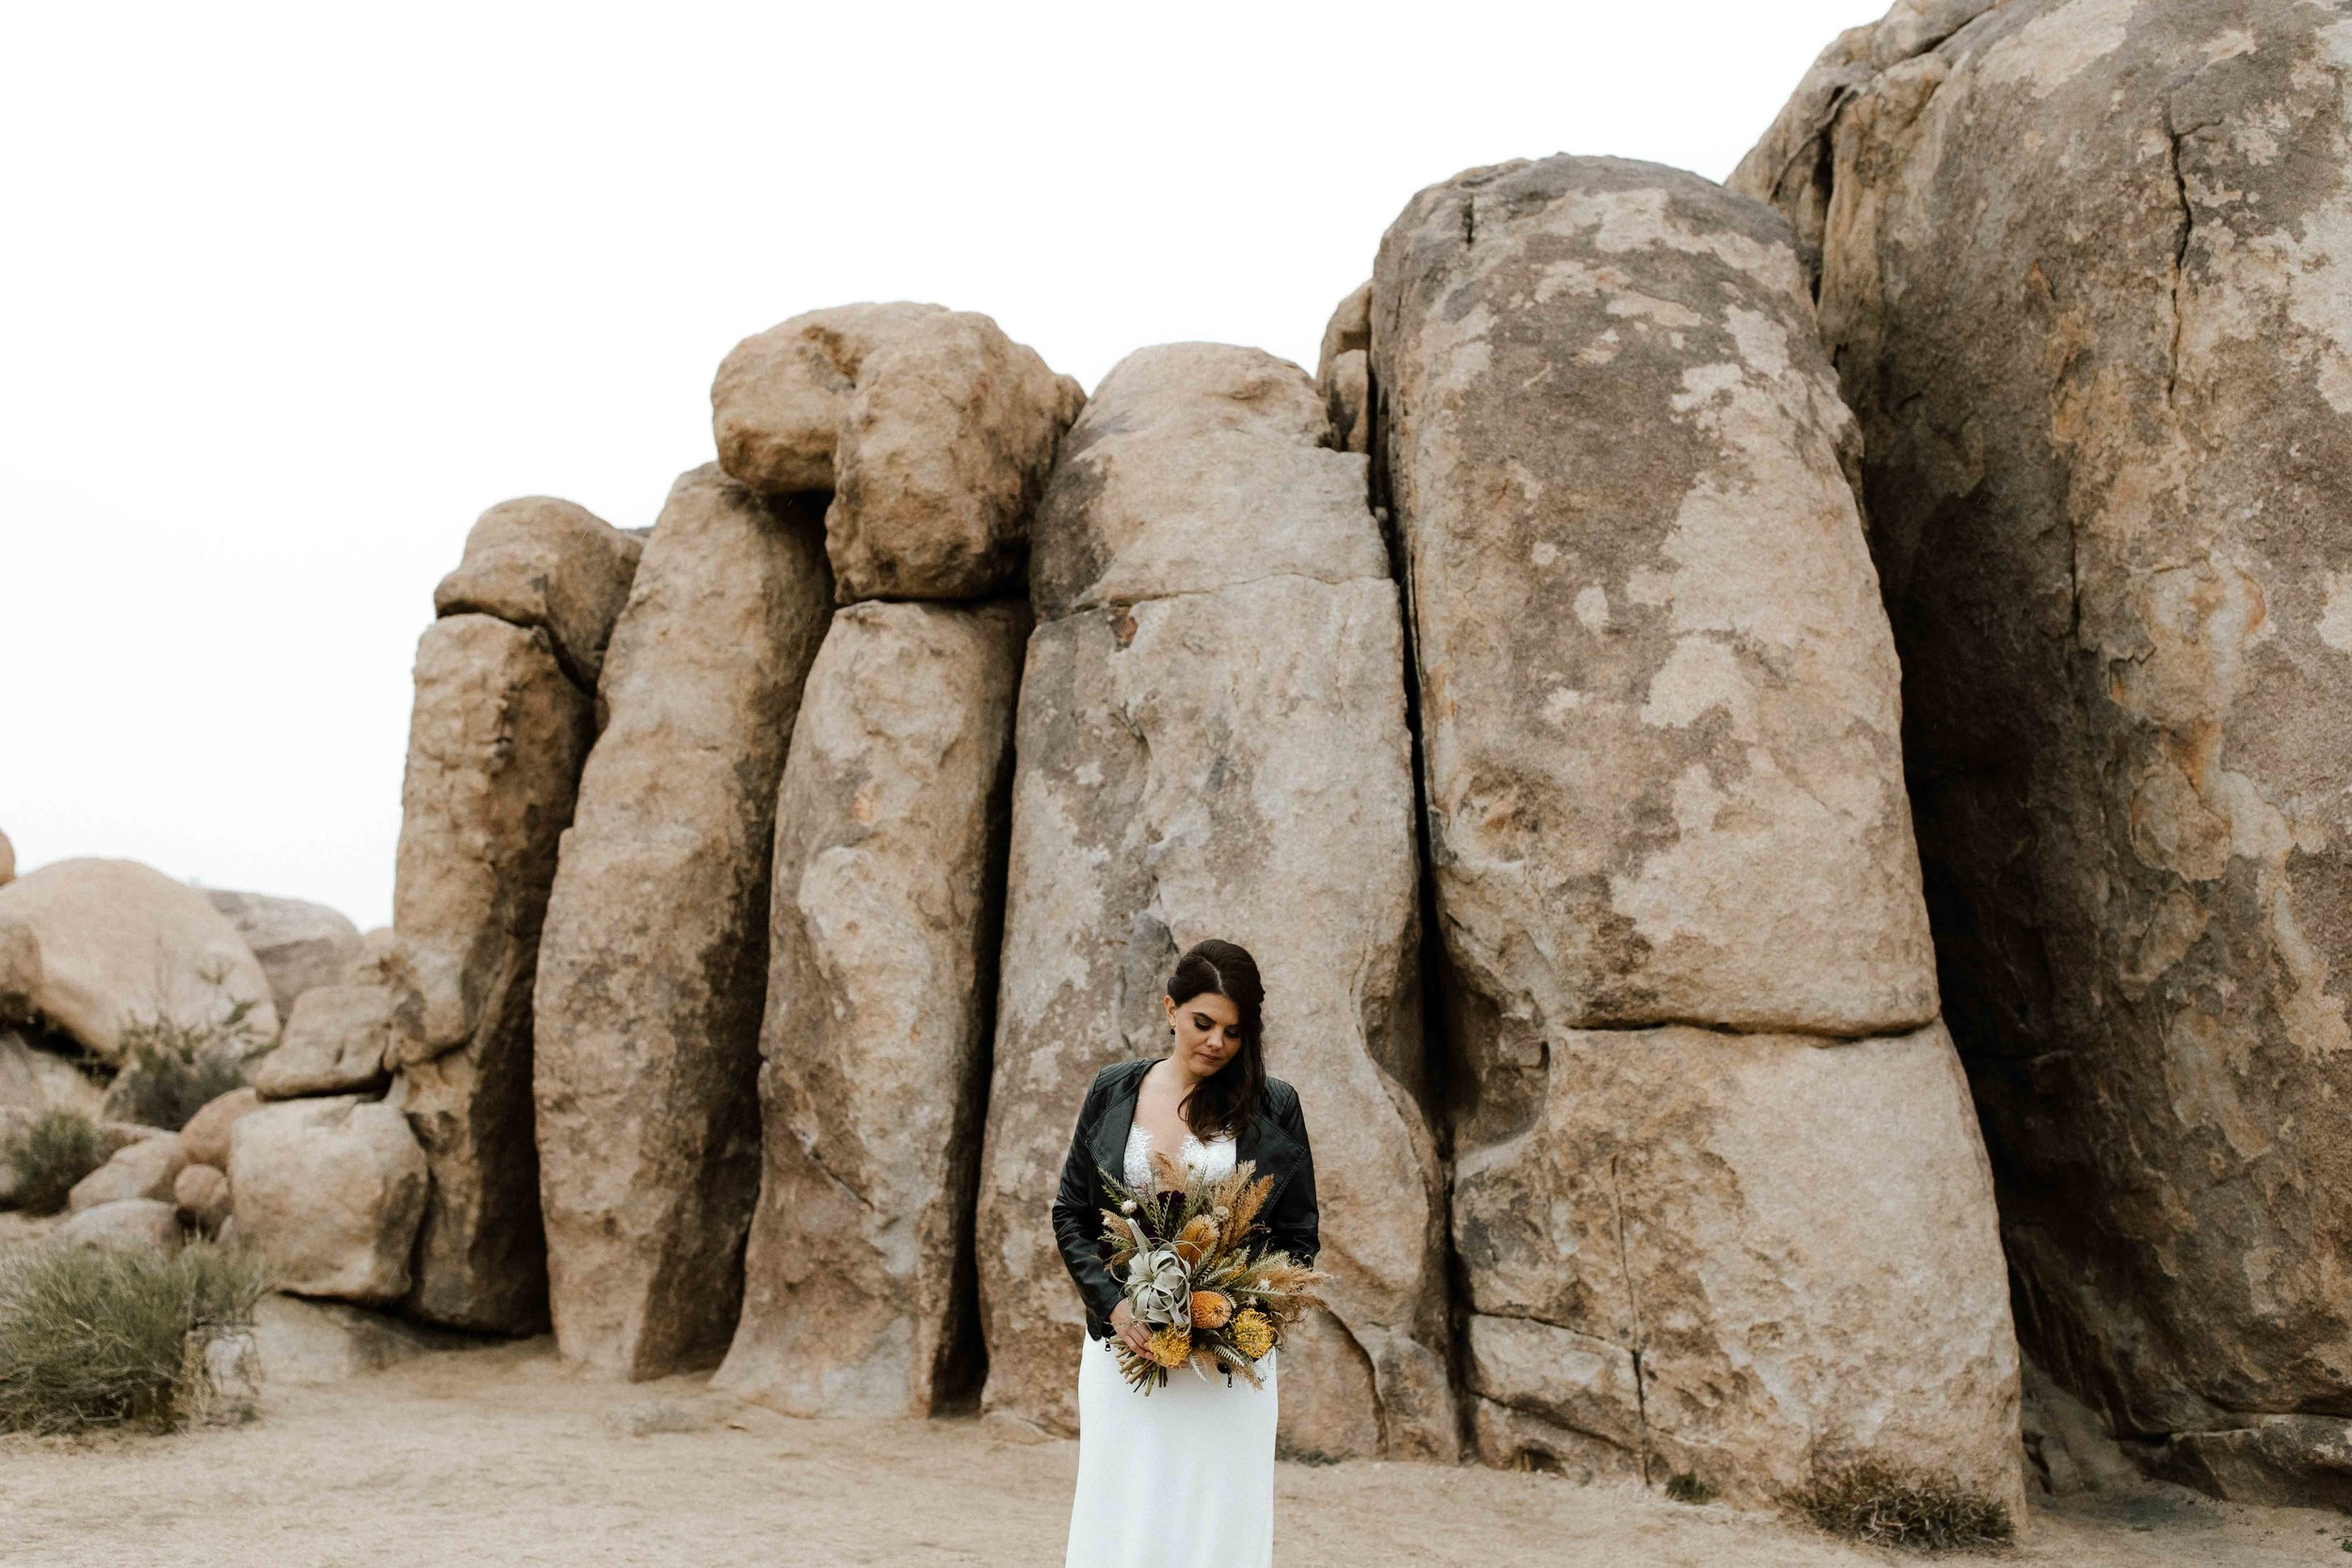 America Joshua Tree Palm Springs Elopement wedding-50.jpg